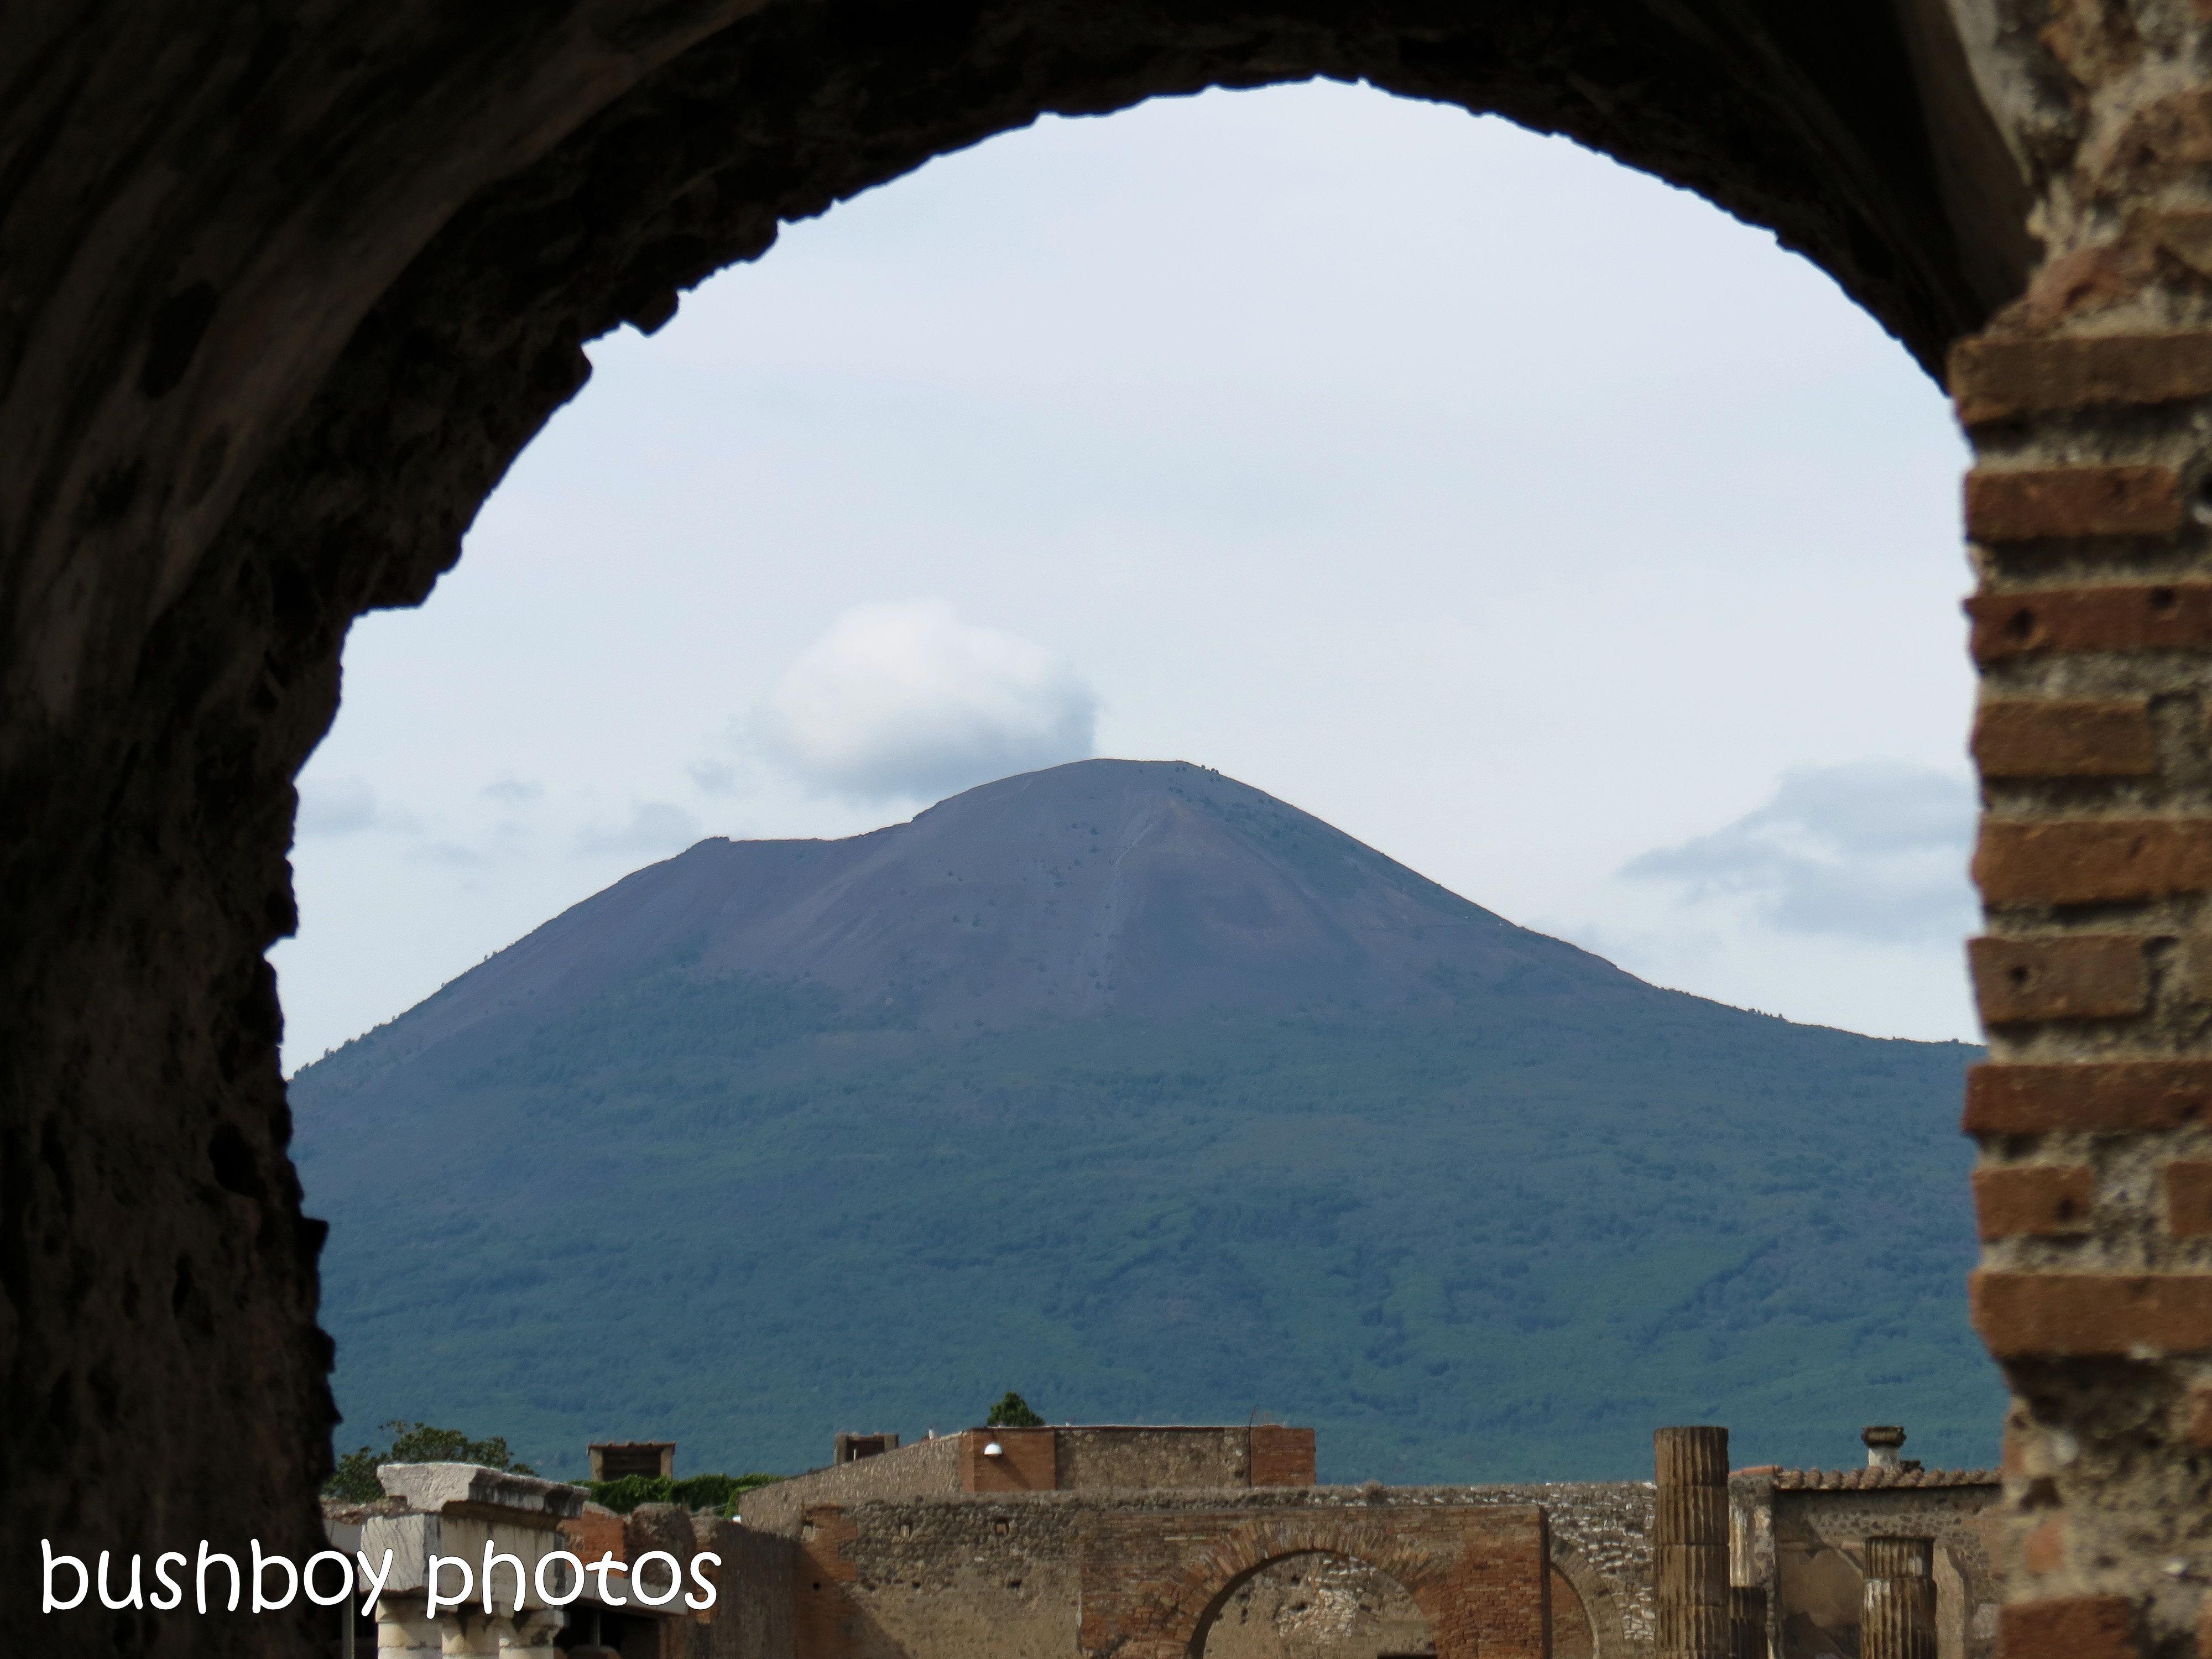 181112_blog challenge_mountain_vesuvius_pompeii